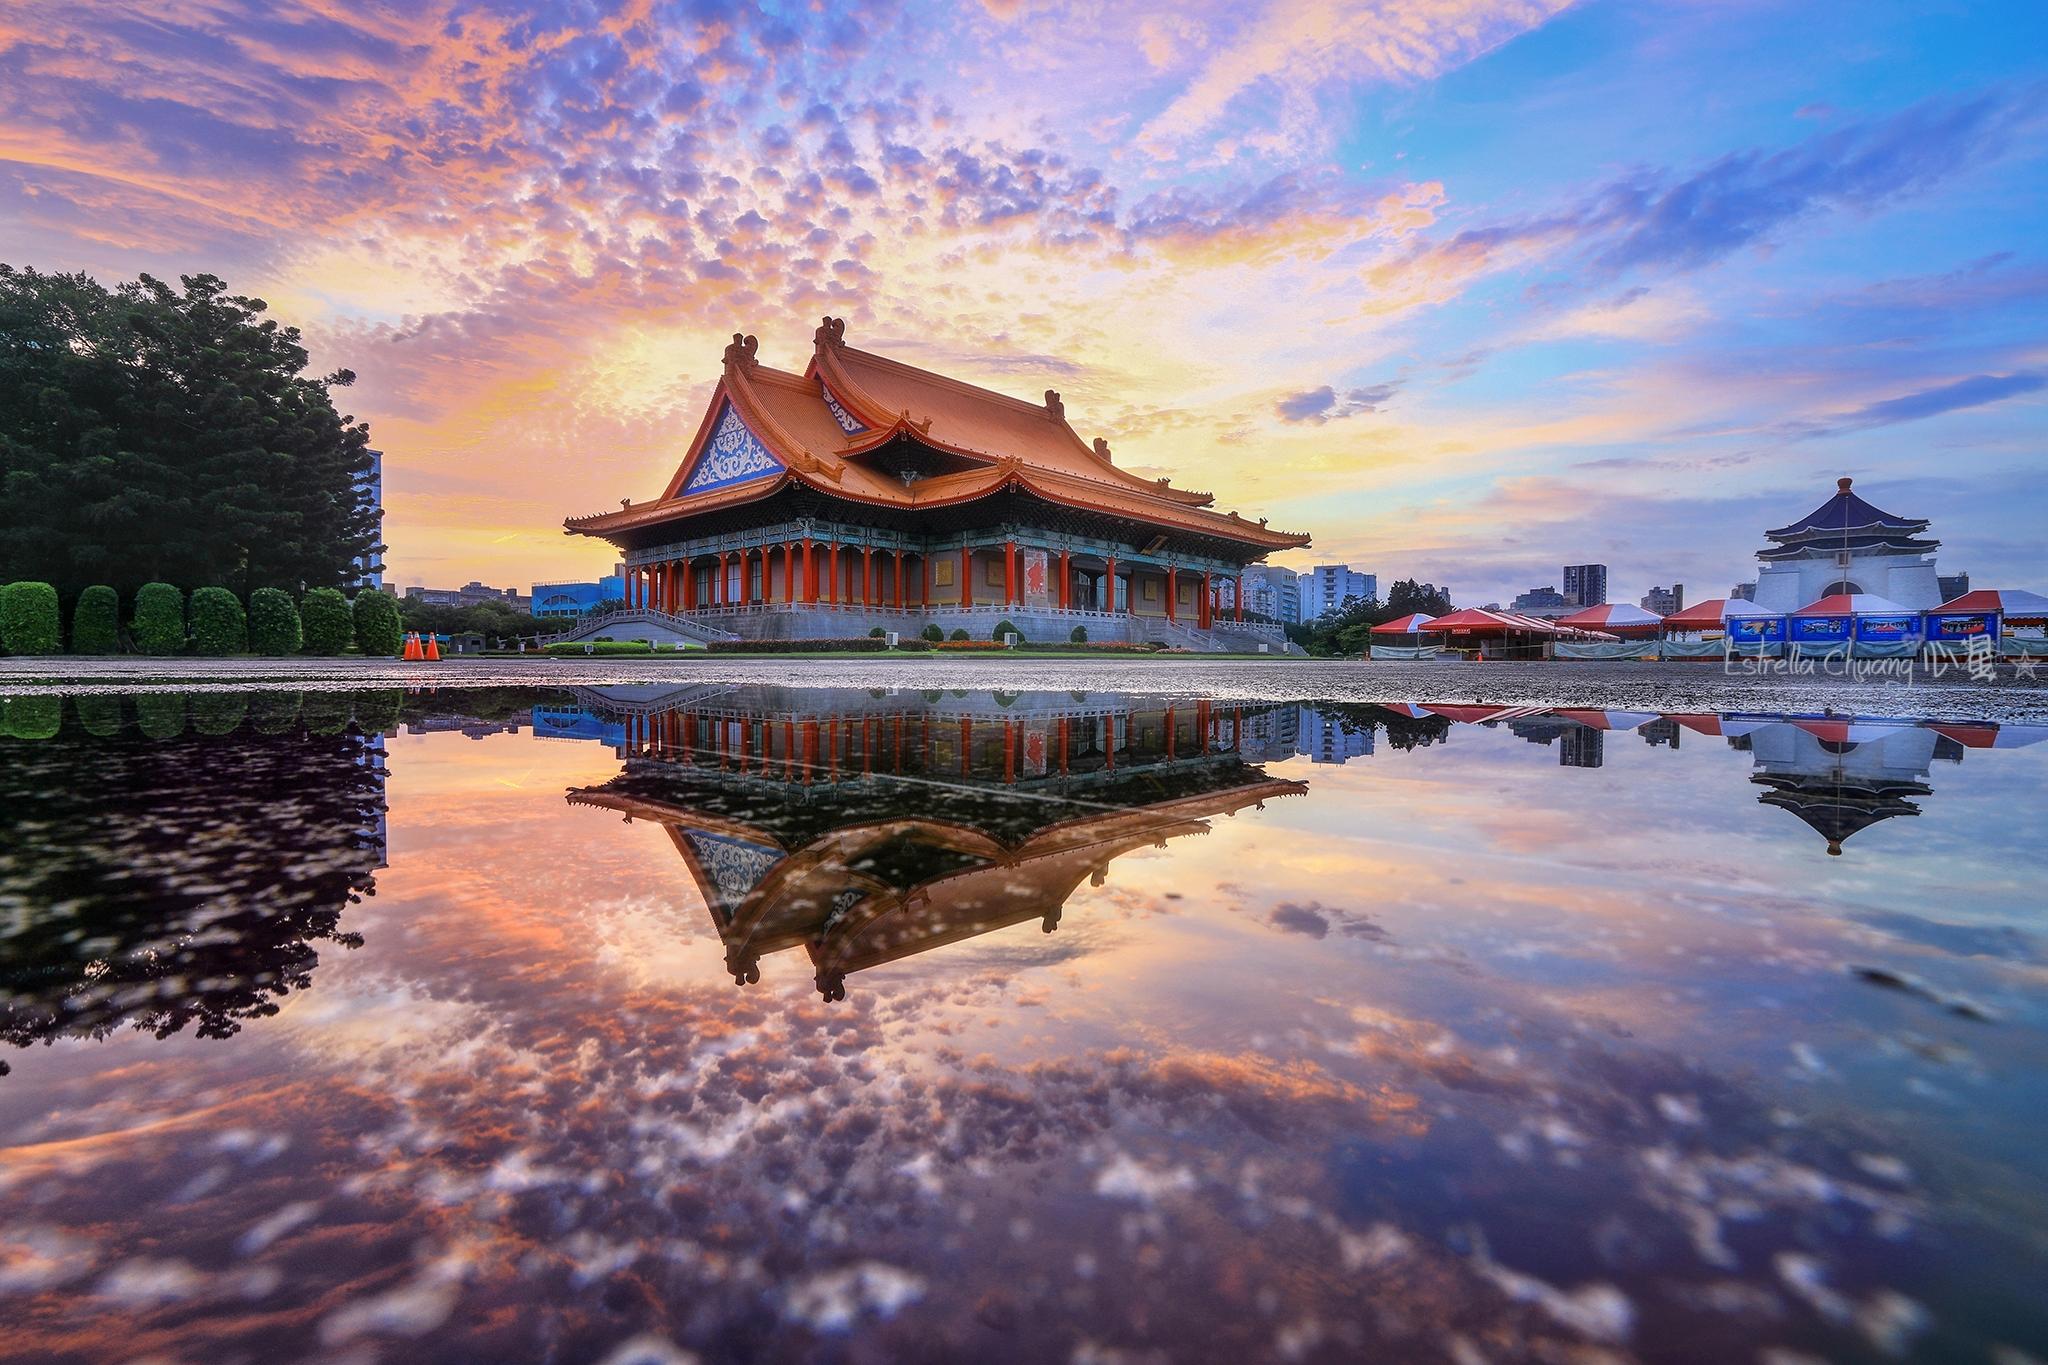 Casas en china - 2048x1365